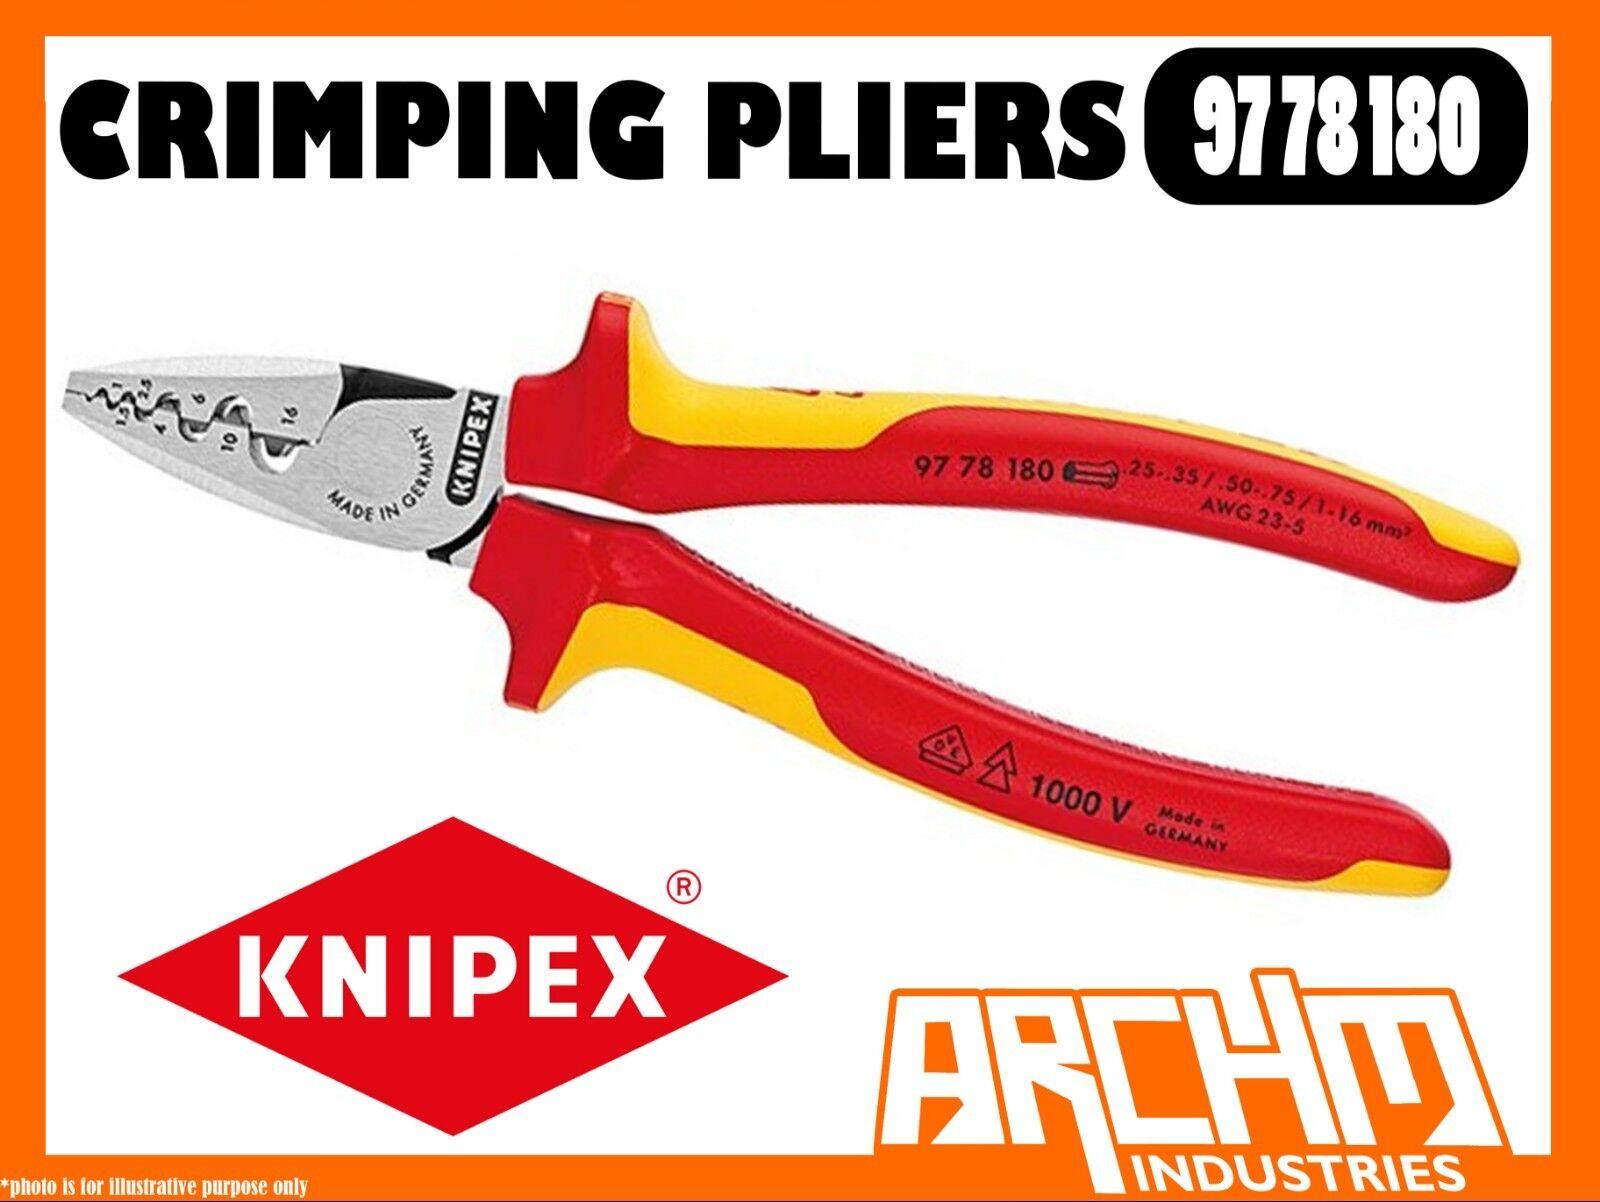 KNIPEX 9778180 - CRIMPING PLIERS END SLEEVES FERRULES SLIM DESIGN 180MM 1000 VDE